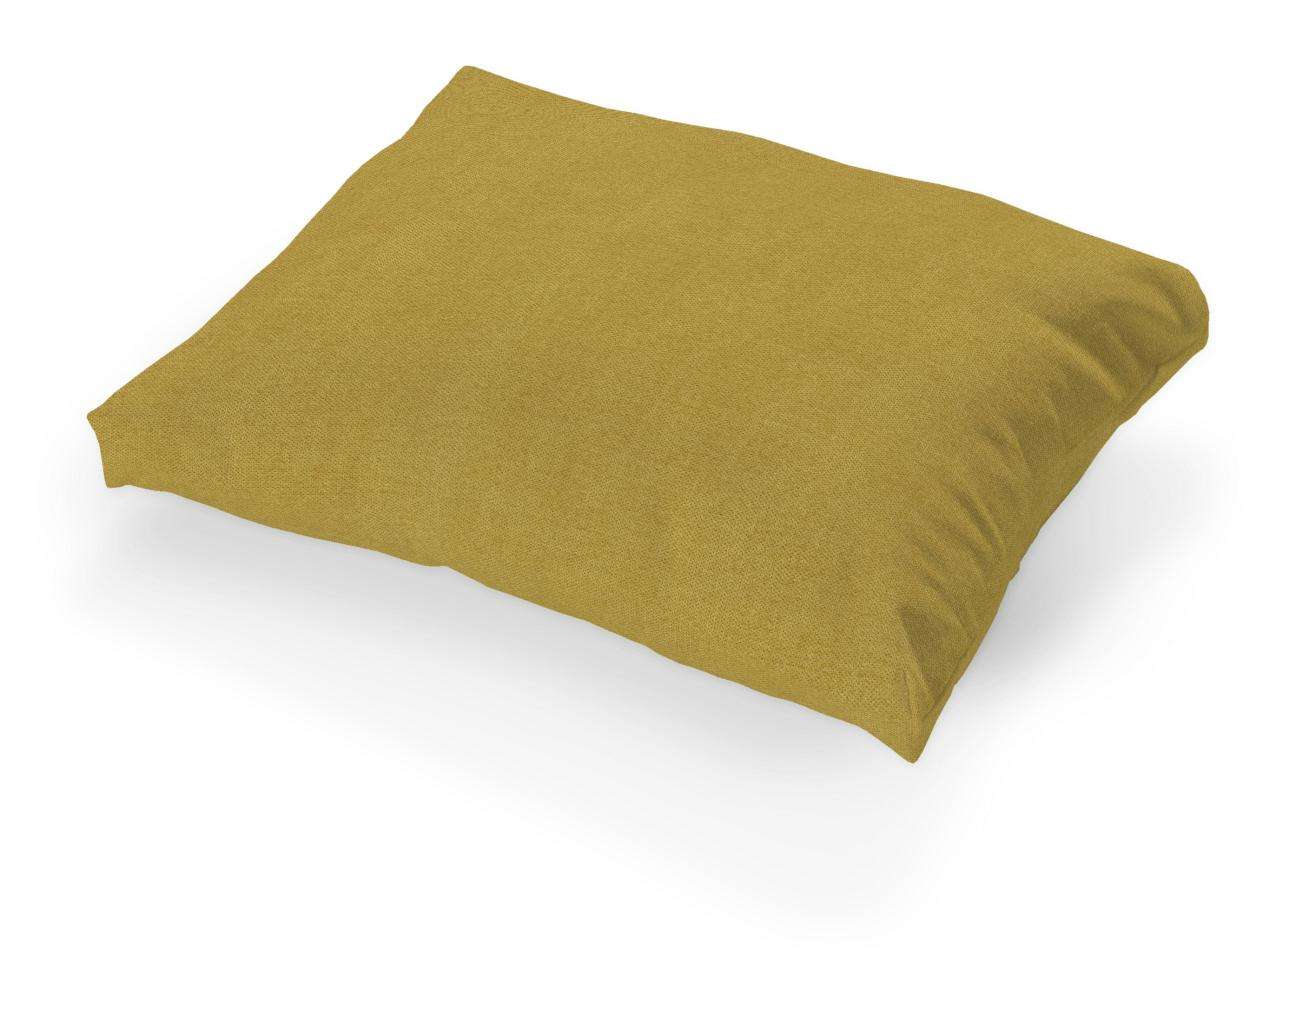 Tylösand pagalvėlės užvalkalas Tylösand pagalvėlė kolekcijoje Etna , audinys: 705-04